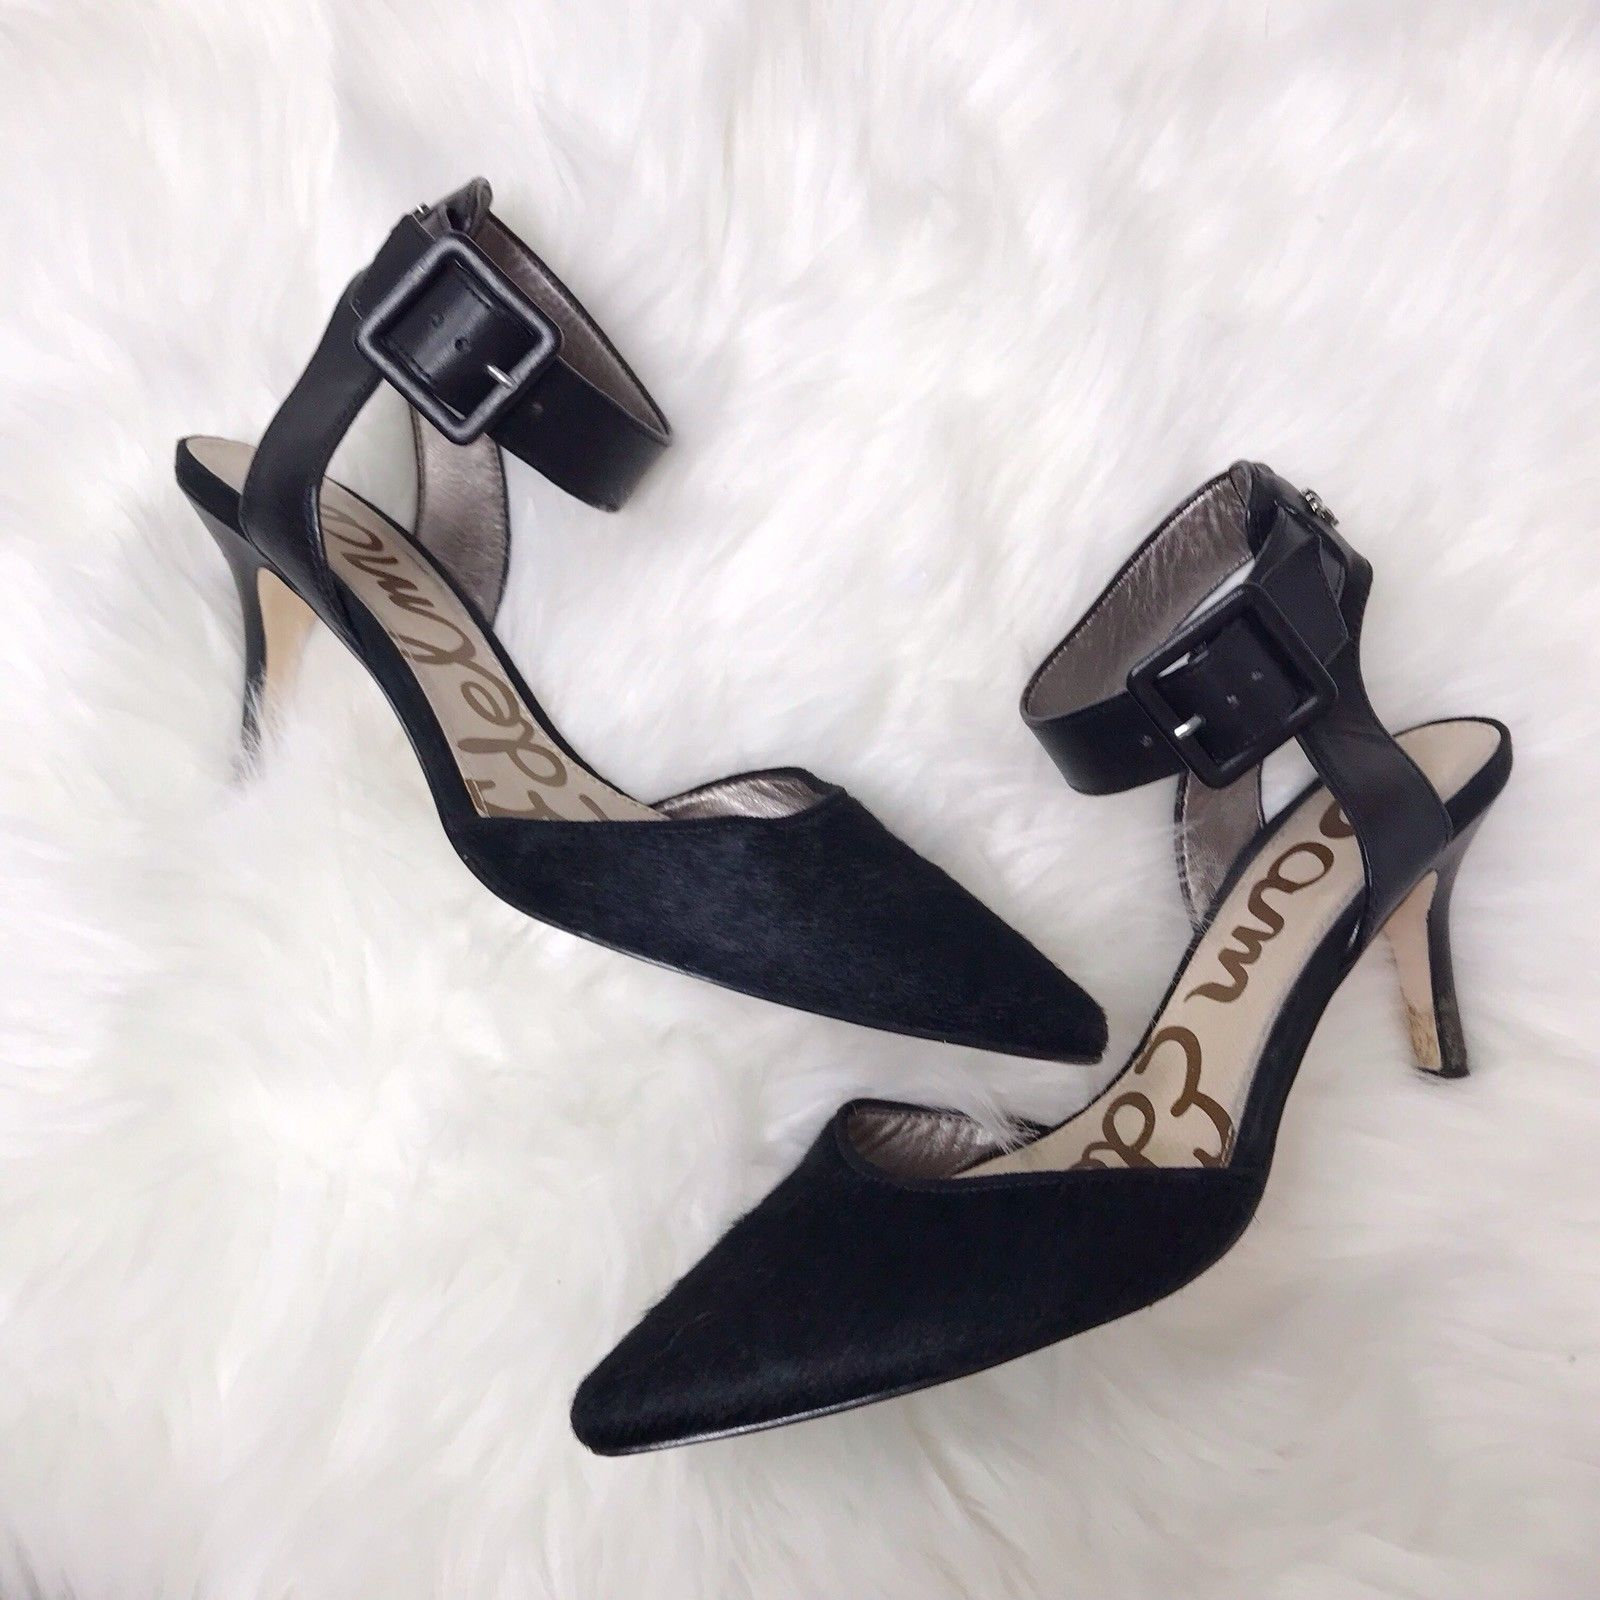 5633b4f0cee82 Ladies Shoes.   44.99